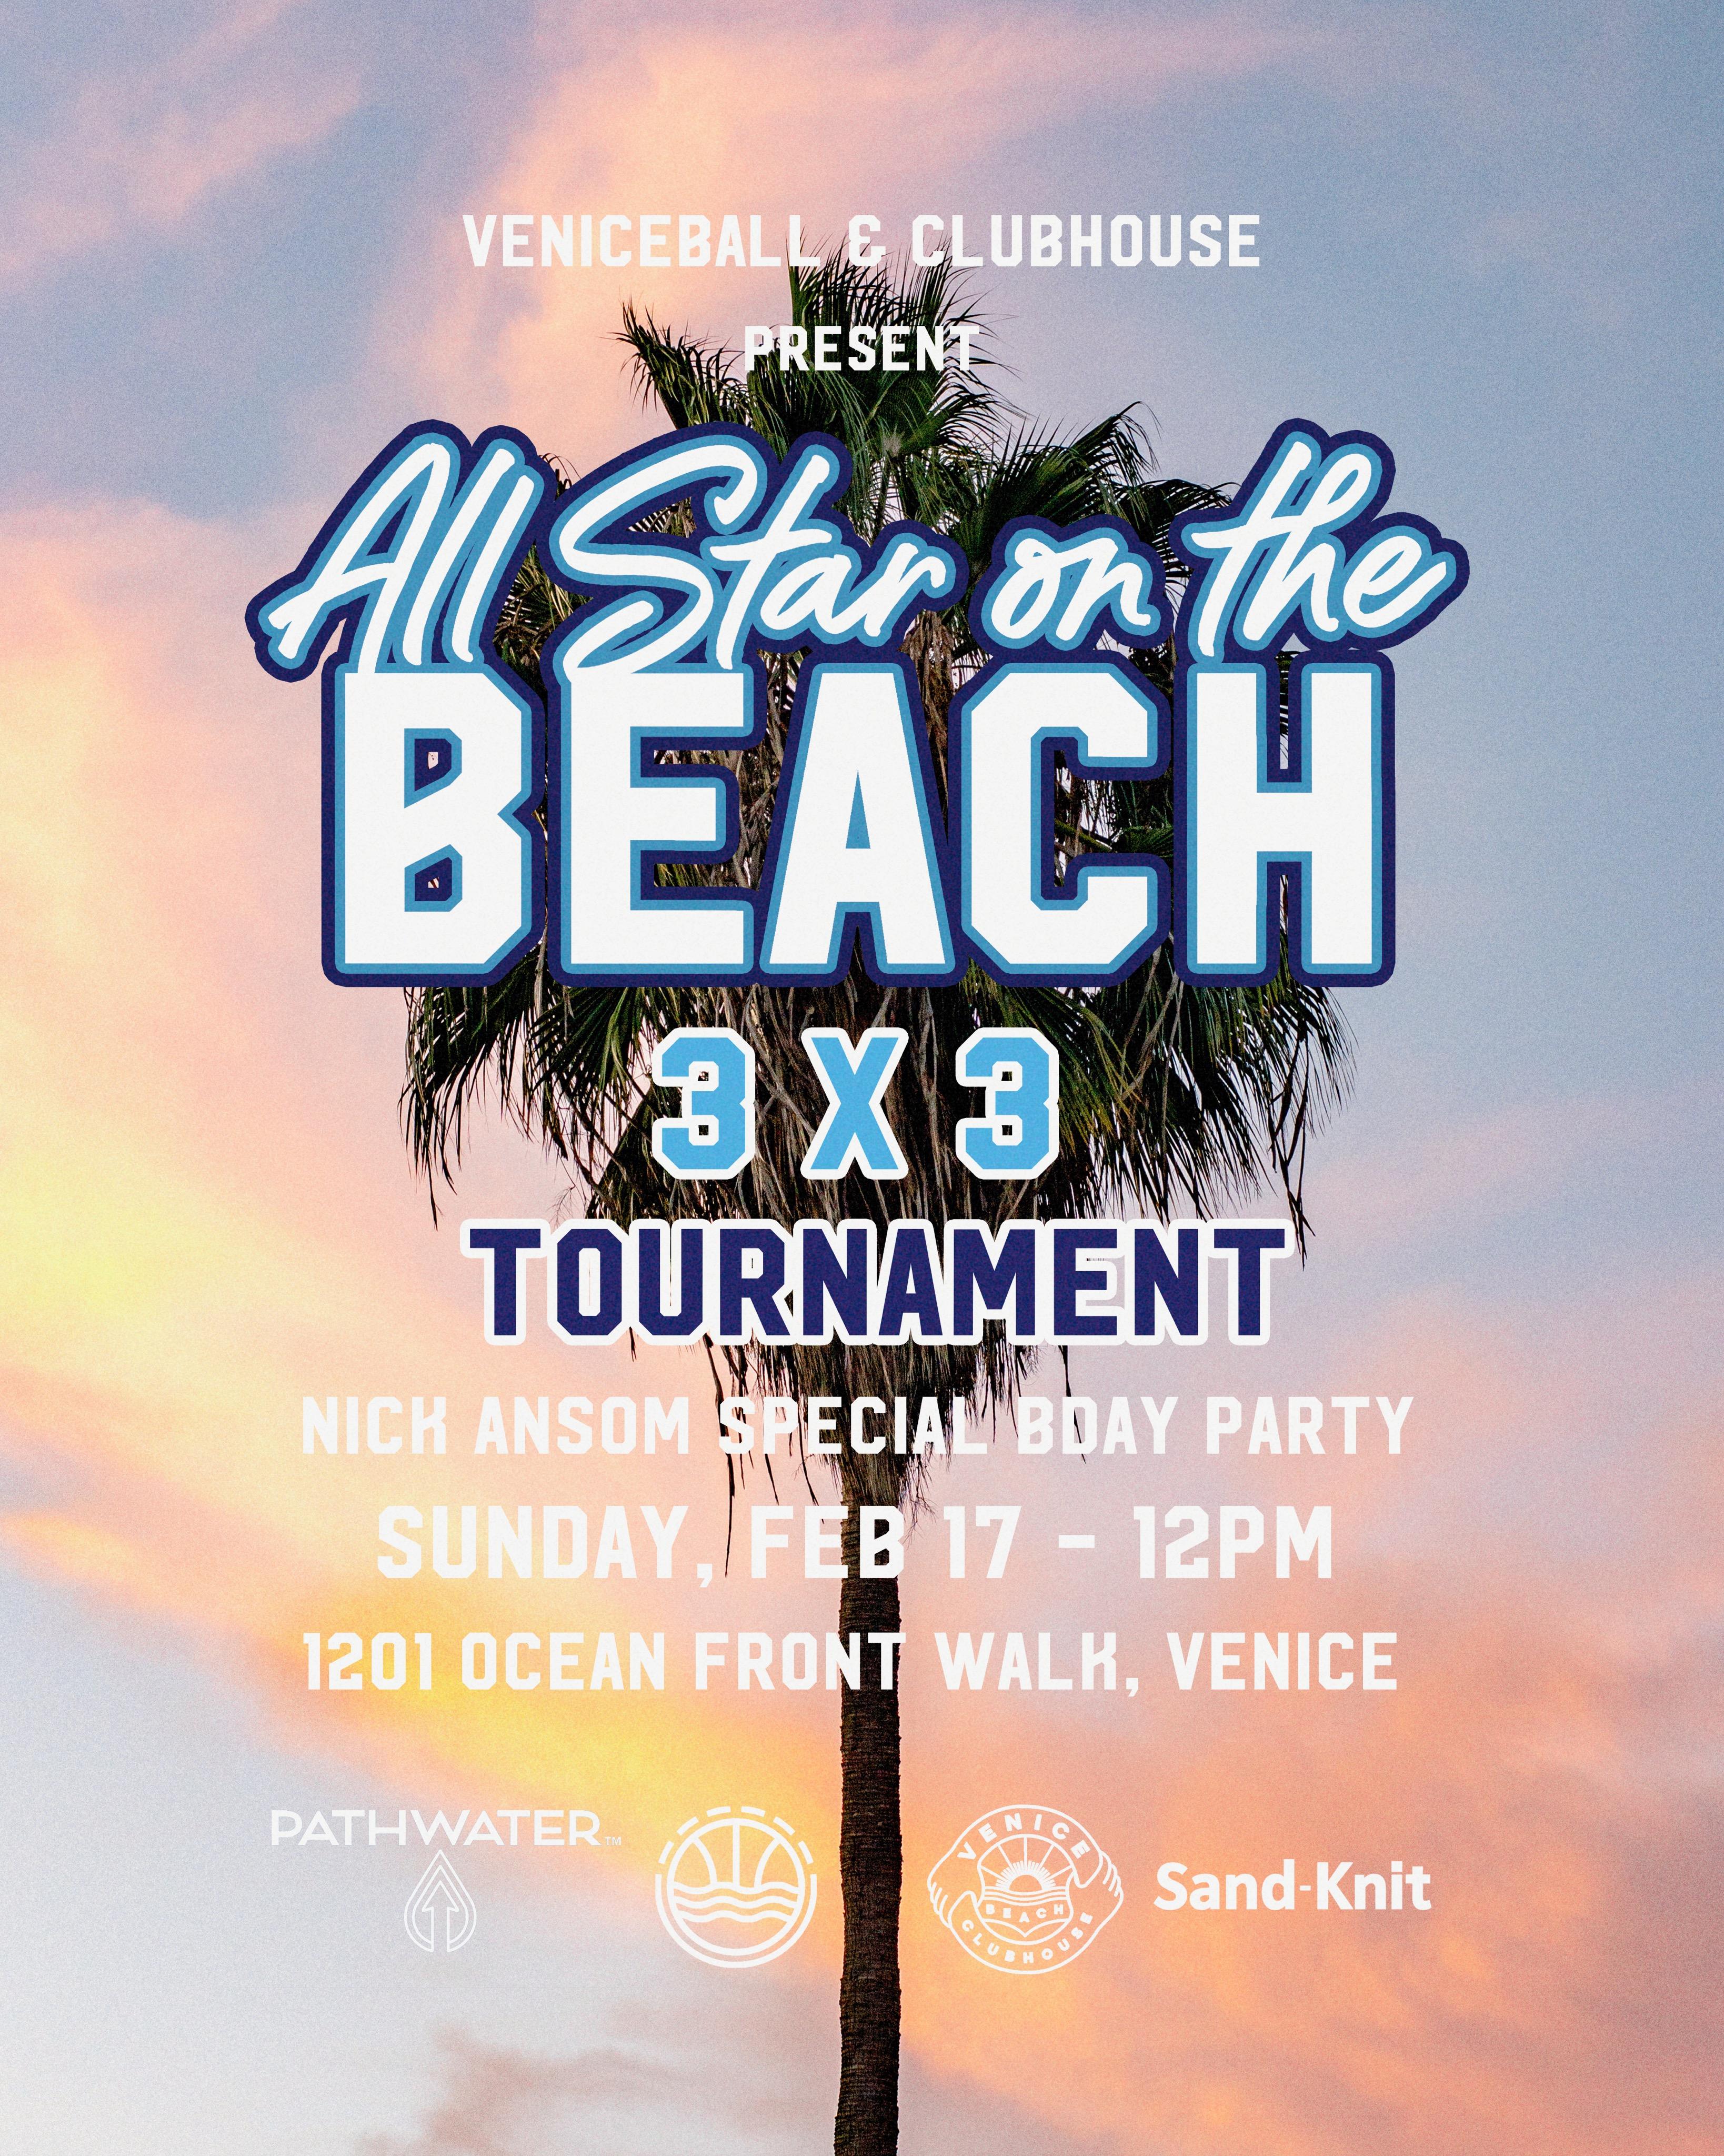 All Star on the Beach this Sunday